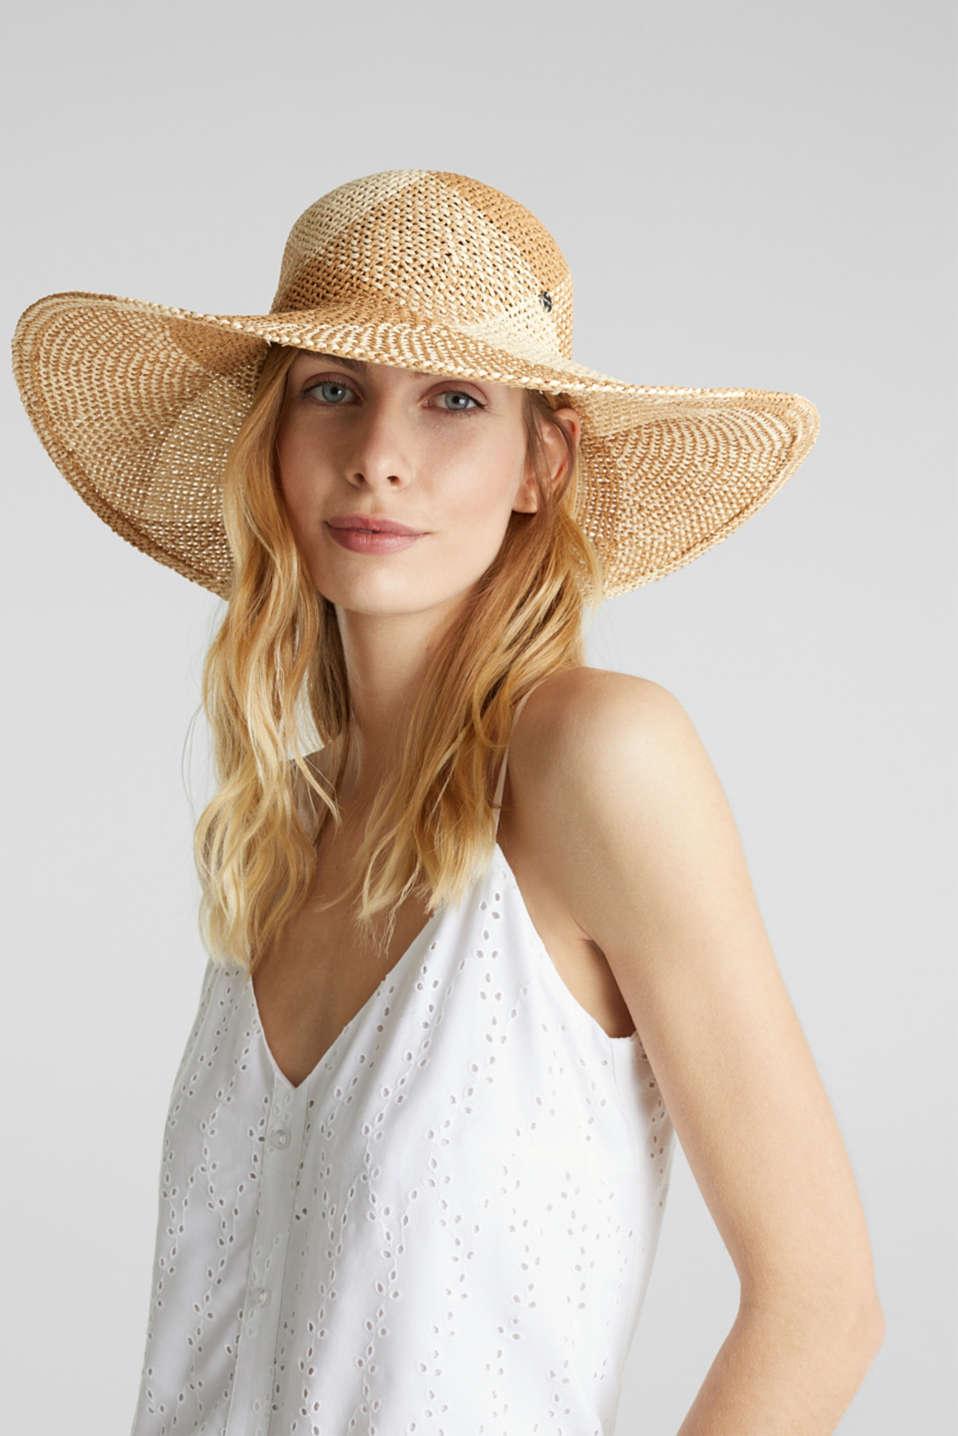 Hand-made straw hat, BEIGE, detail image number 2